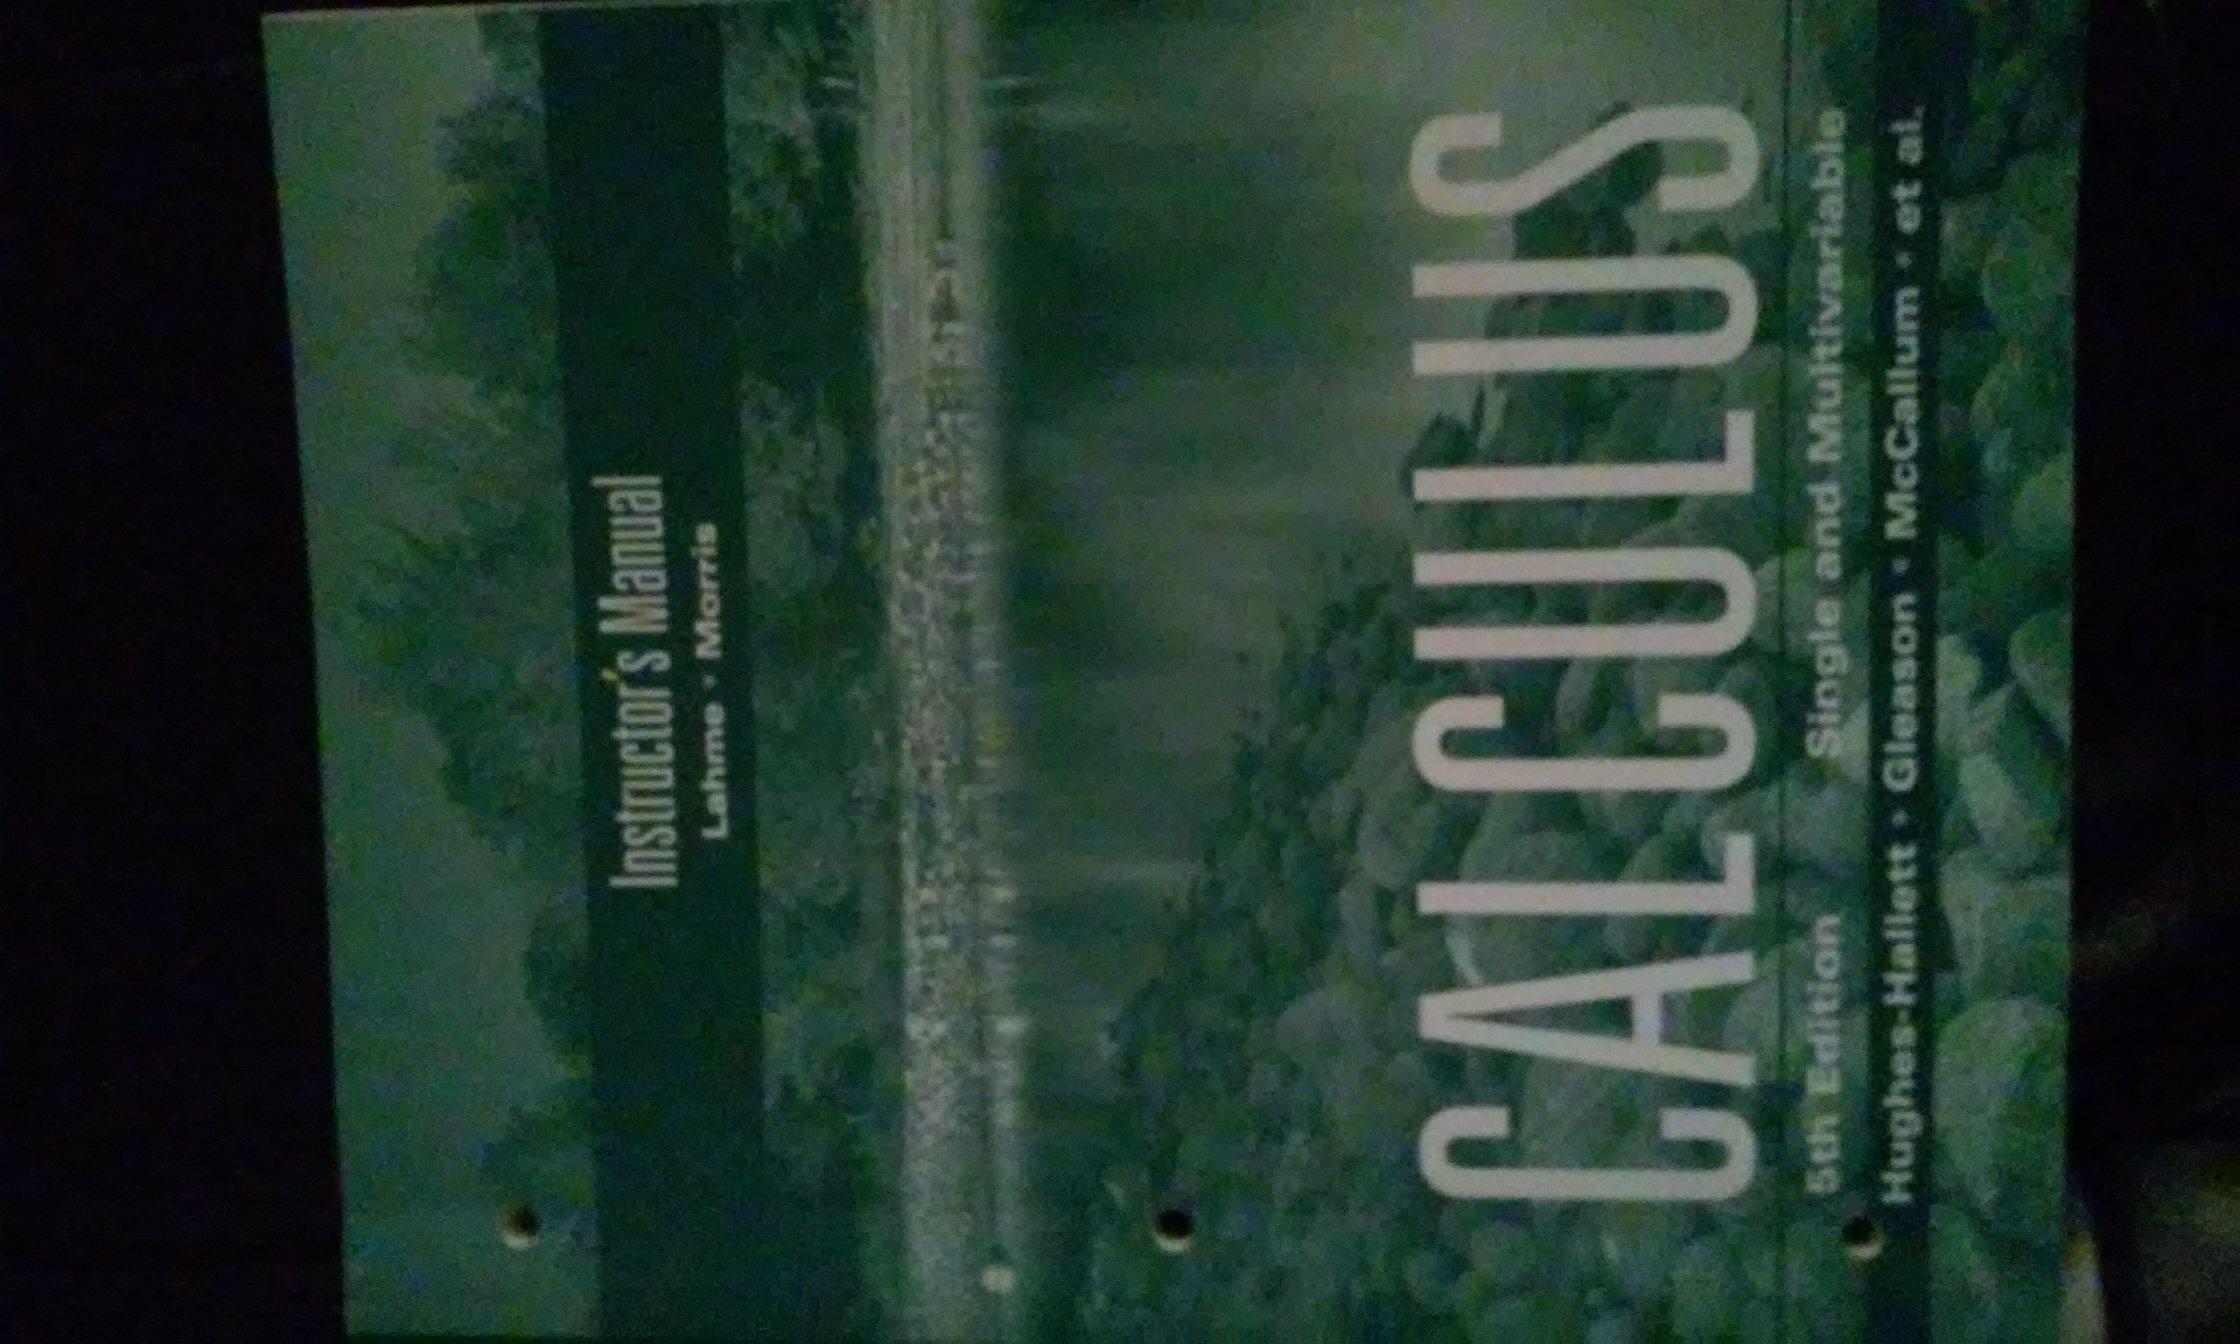 Calculus - Single and Multivariable, Fifth Edition (Instructor's Edition):  Gleason, McCallum Hughes-Hallett: 9780470414156: Amazon.com: Books